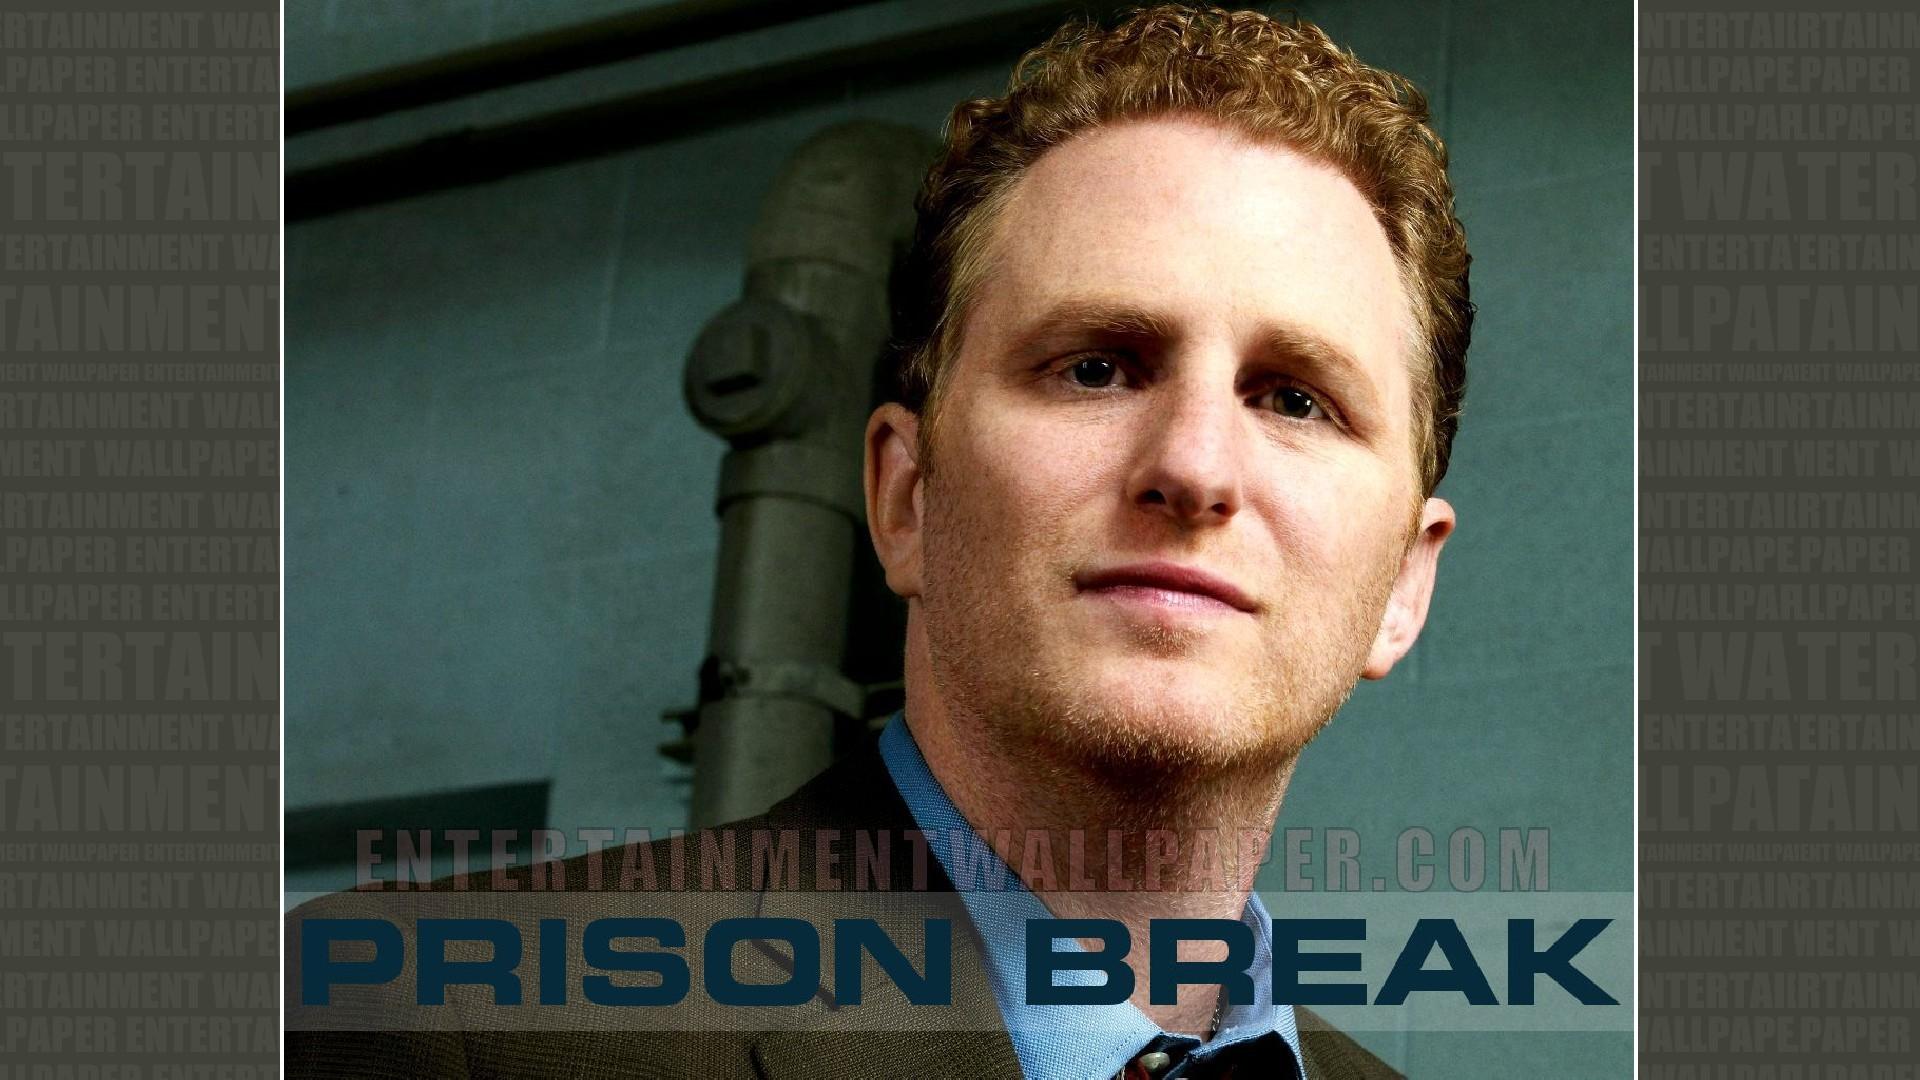 Prison Break Wallpaper – Original size, download now.